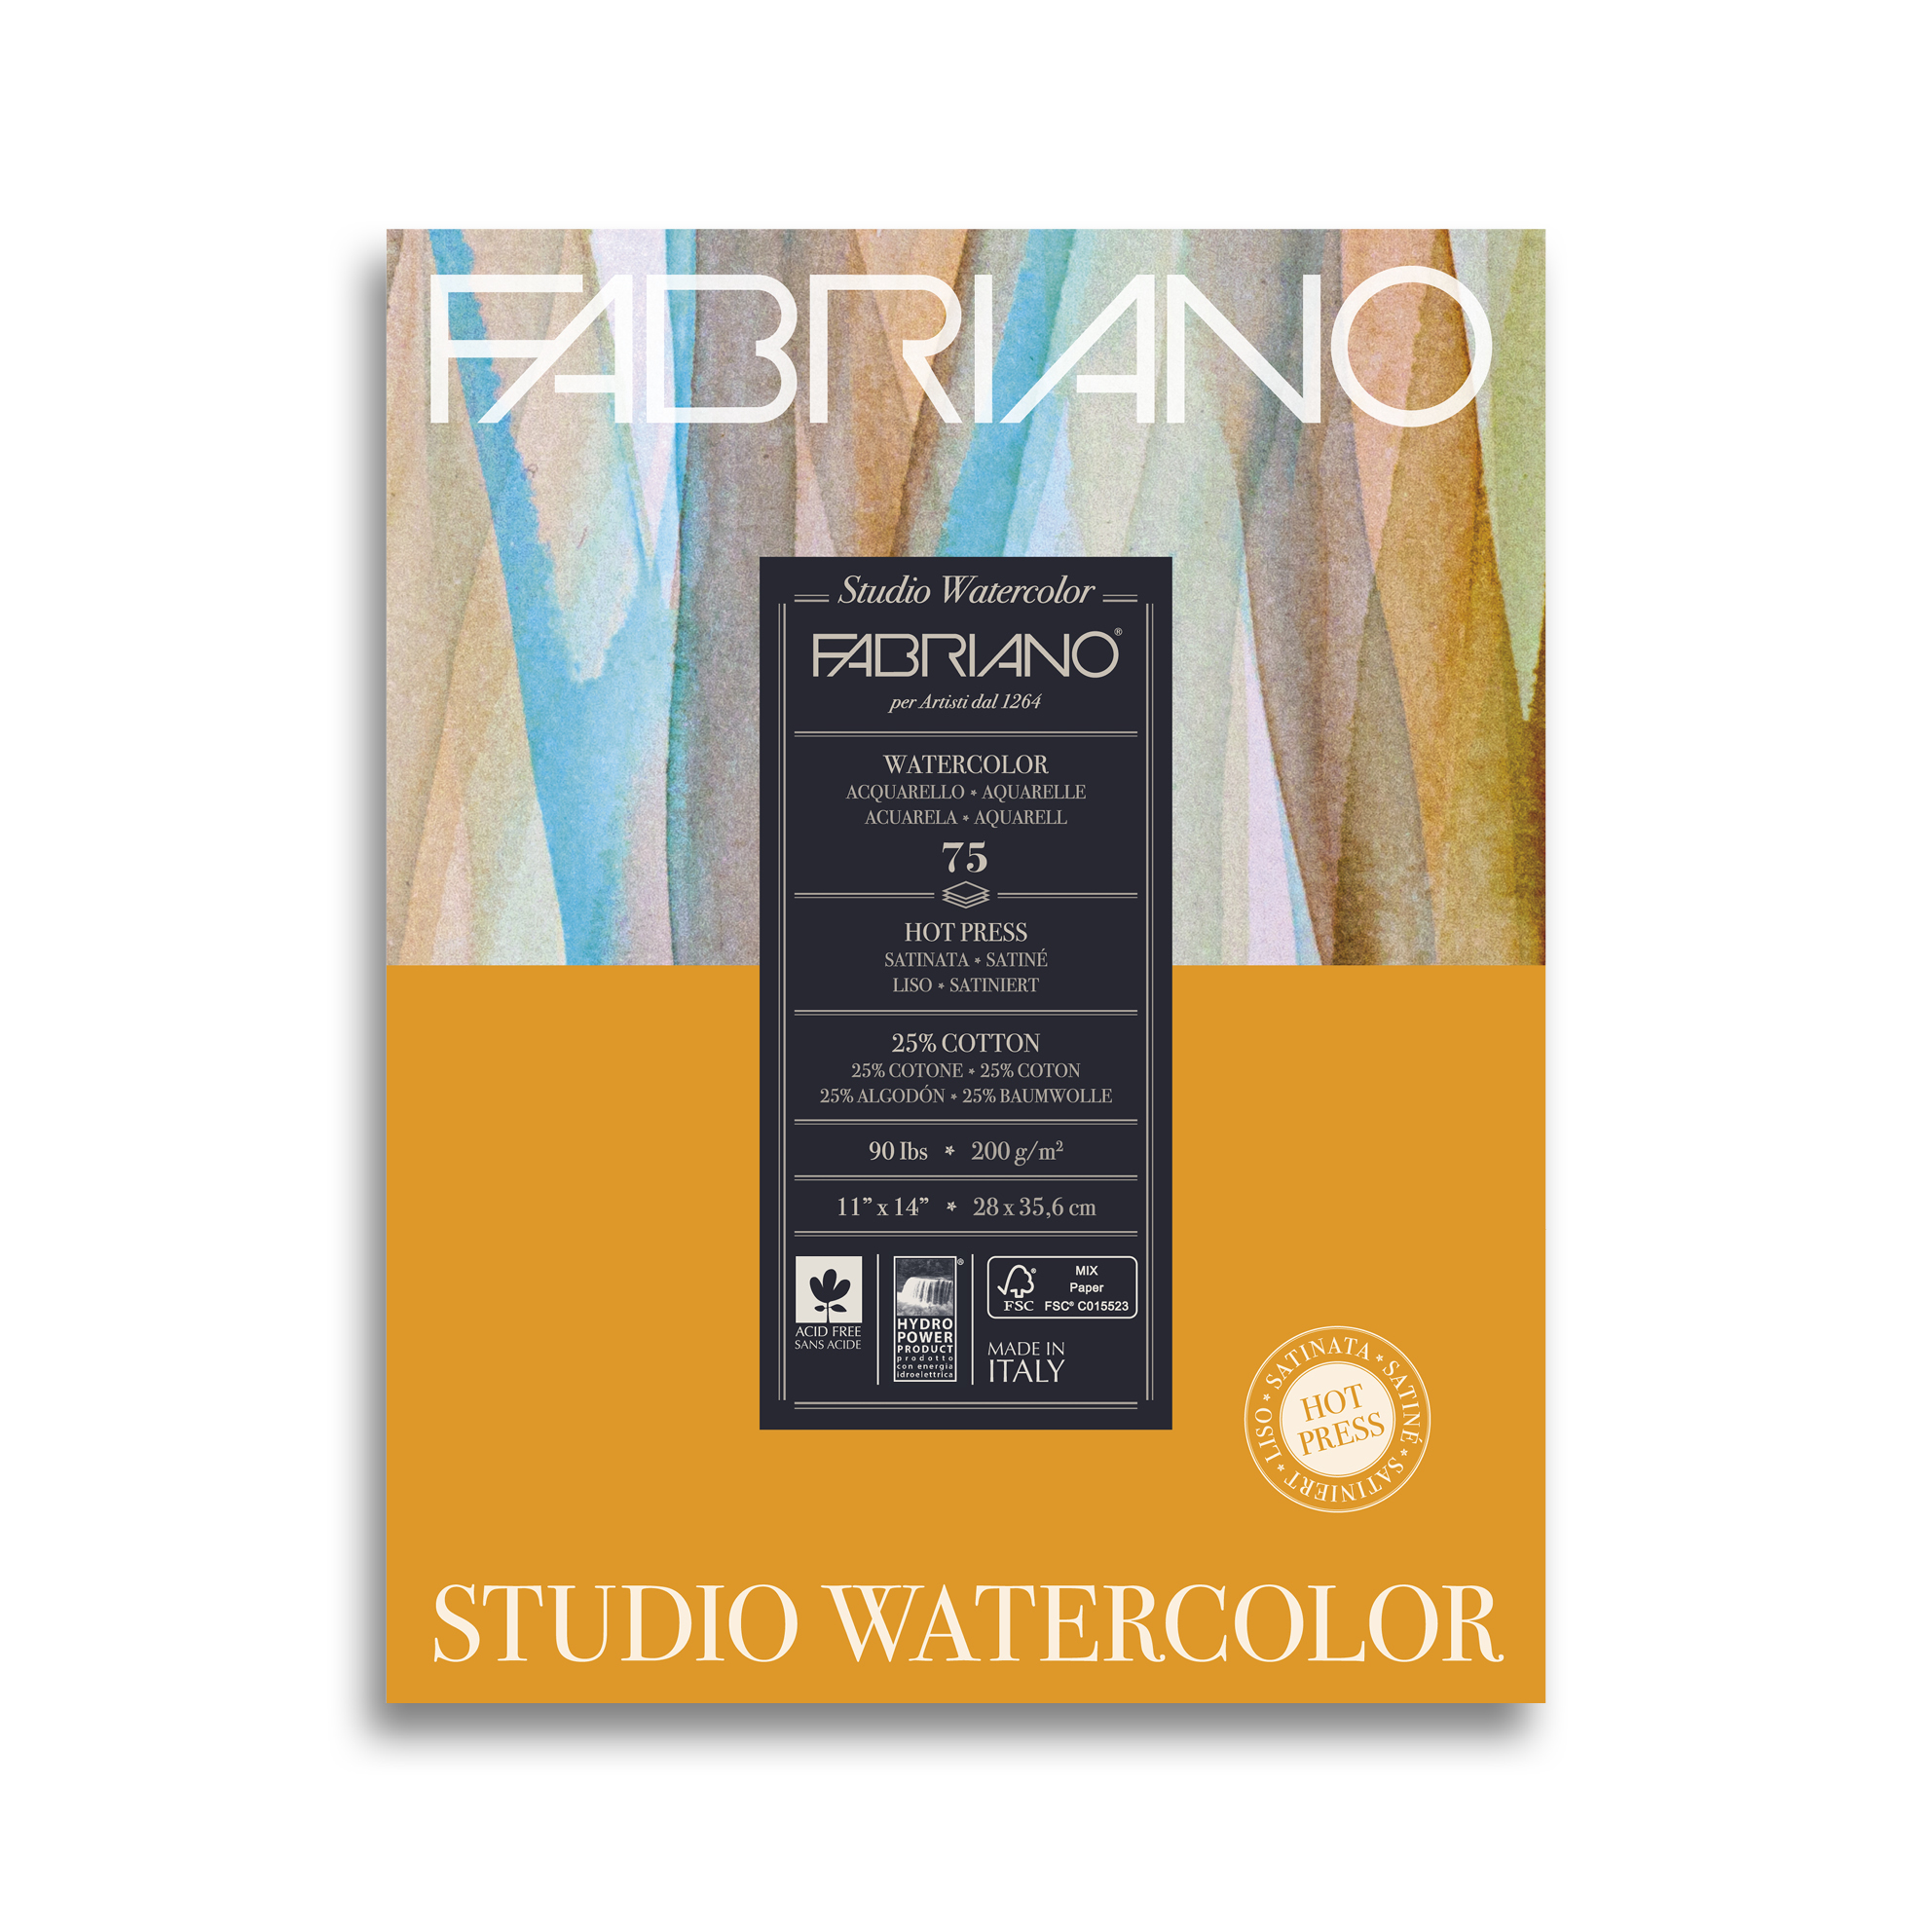 Альбом для акварели FABRIANO Watercolour 28*35,6см 25%хл сатин 200 гр/м, 75 л, склейка